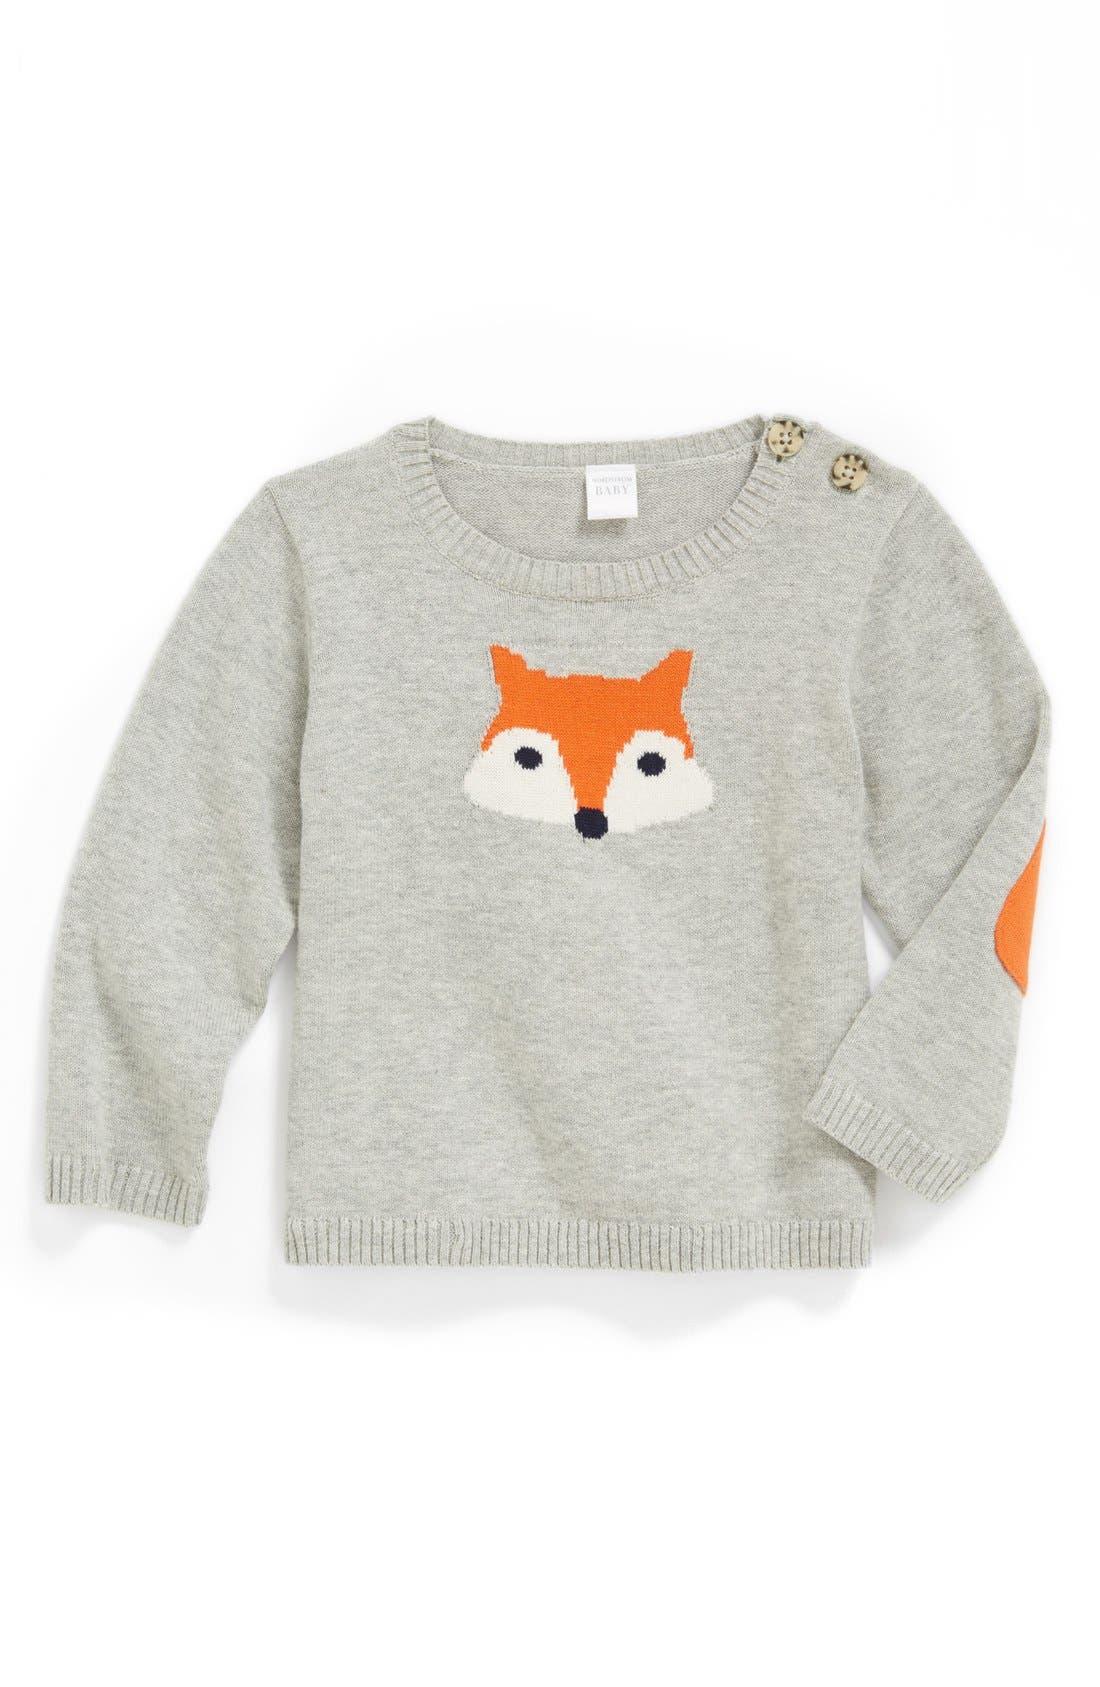 Main Image - Nordstrom Baby Intarsia Knit Sweater (Baby Boys)